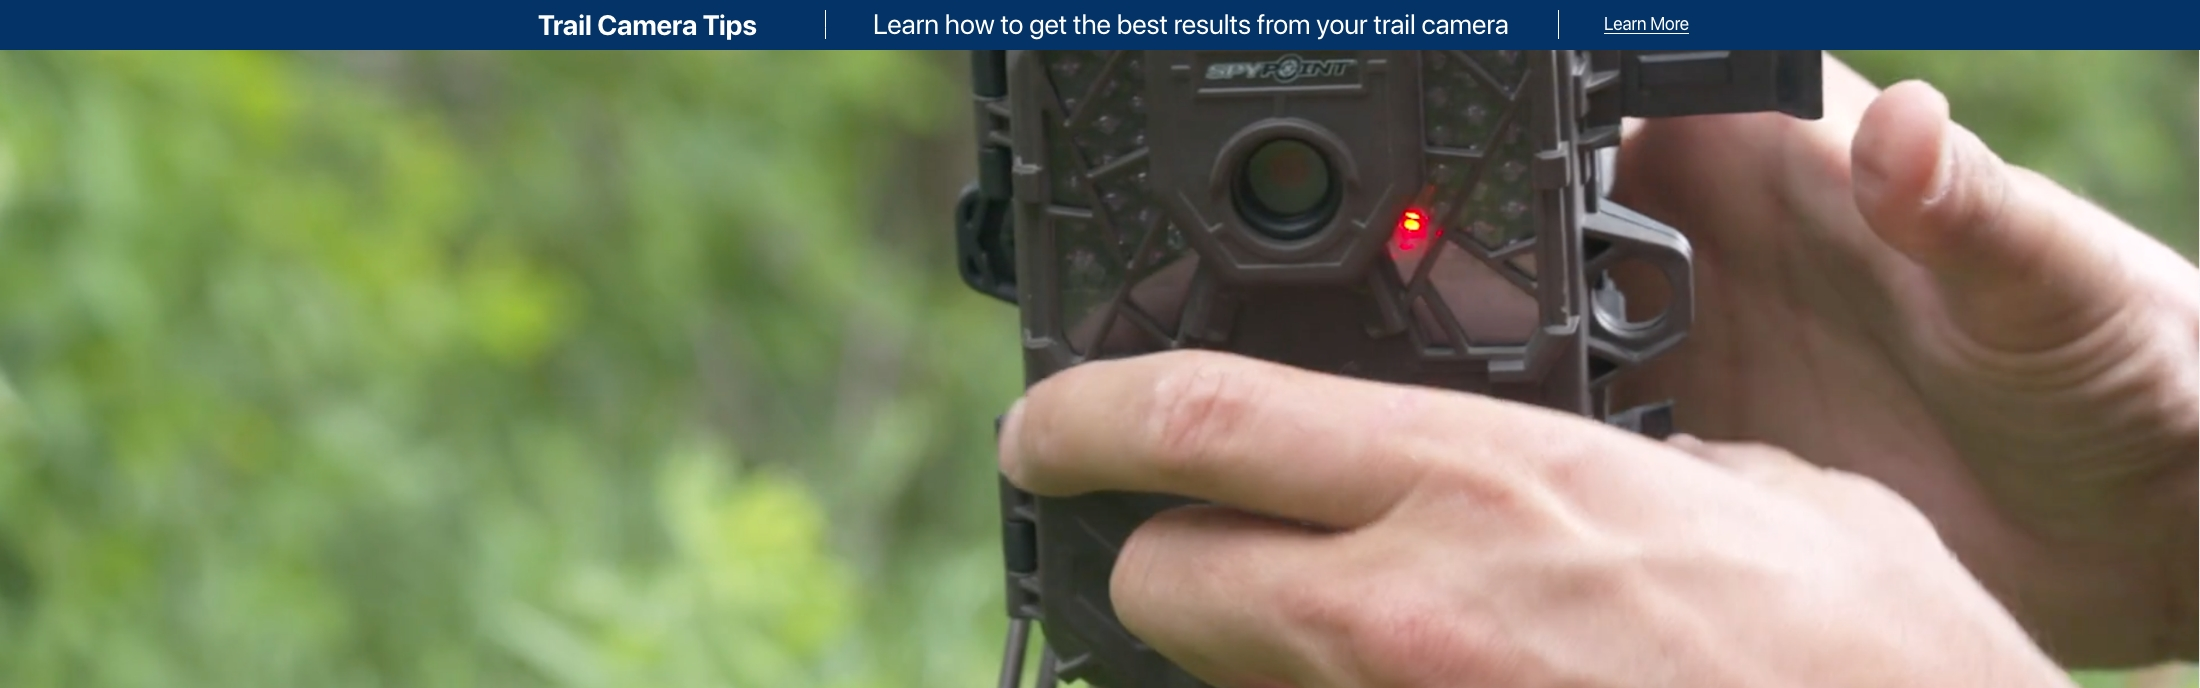 Trail Camera Tips